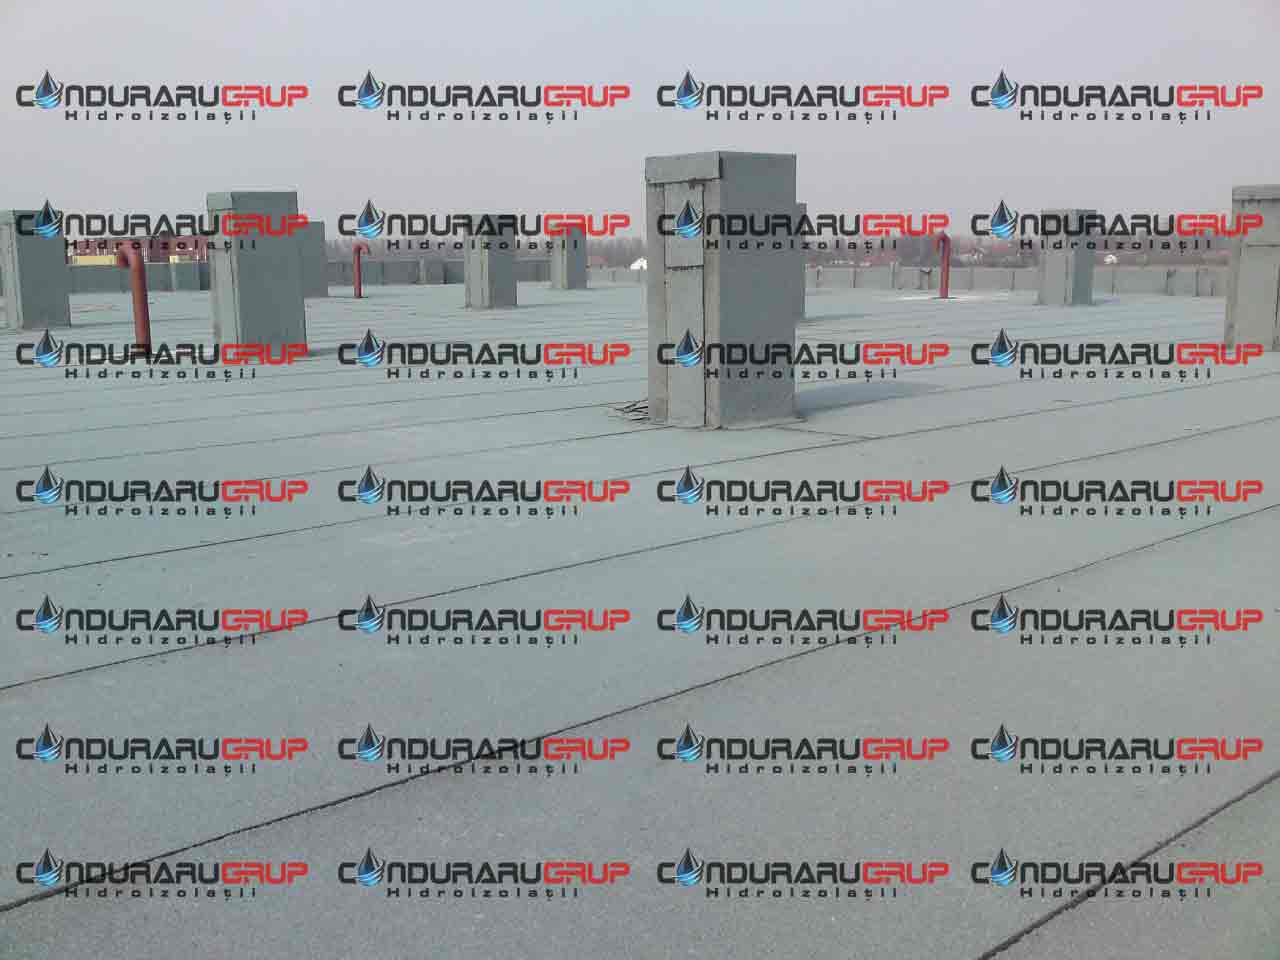 Lucrari de reabilitare hidroizolatie CONDURARU GRUP - Poza 4